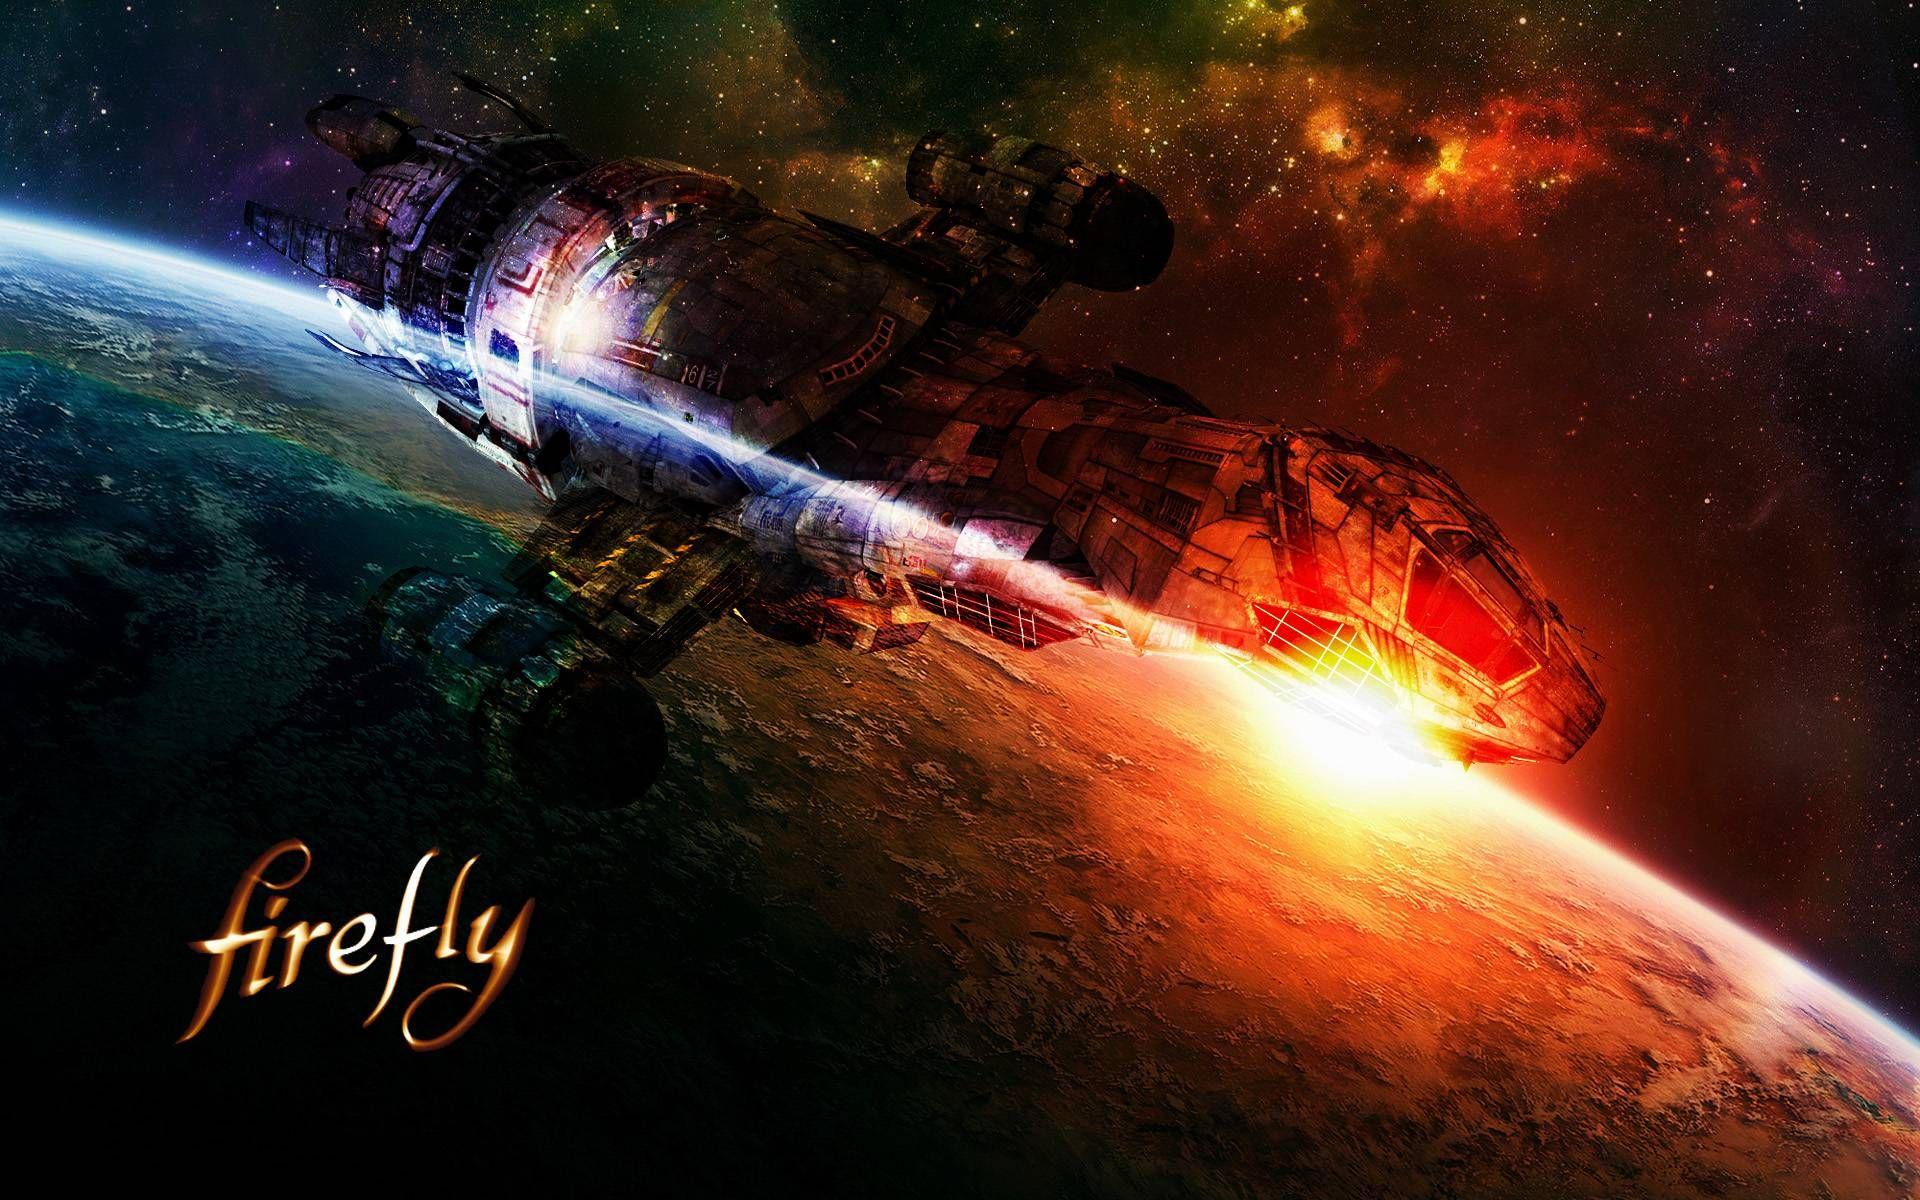 Hd Firefly Wallpaper Firefly Serenity Firefly River Tam